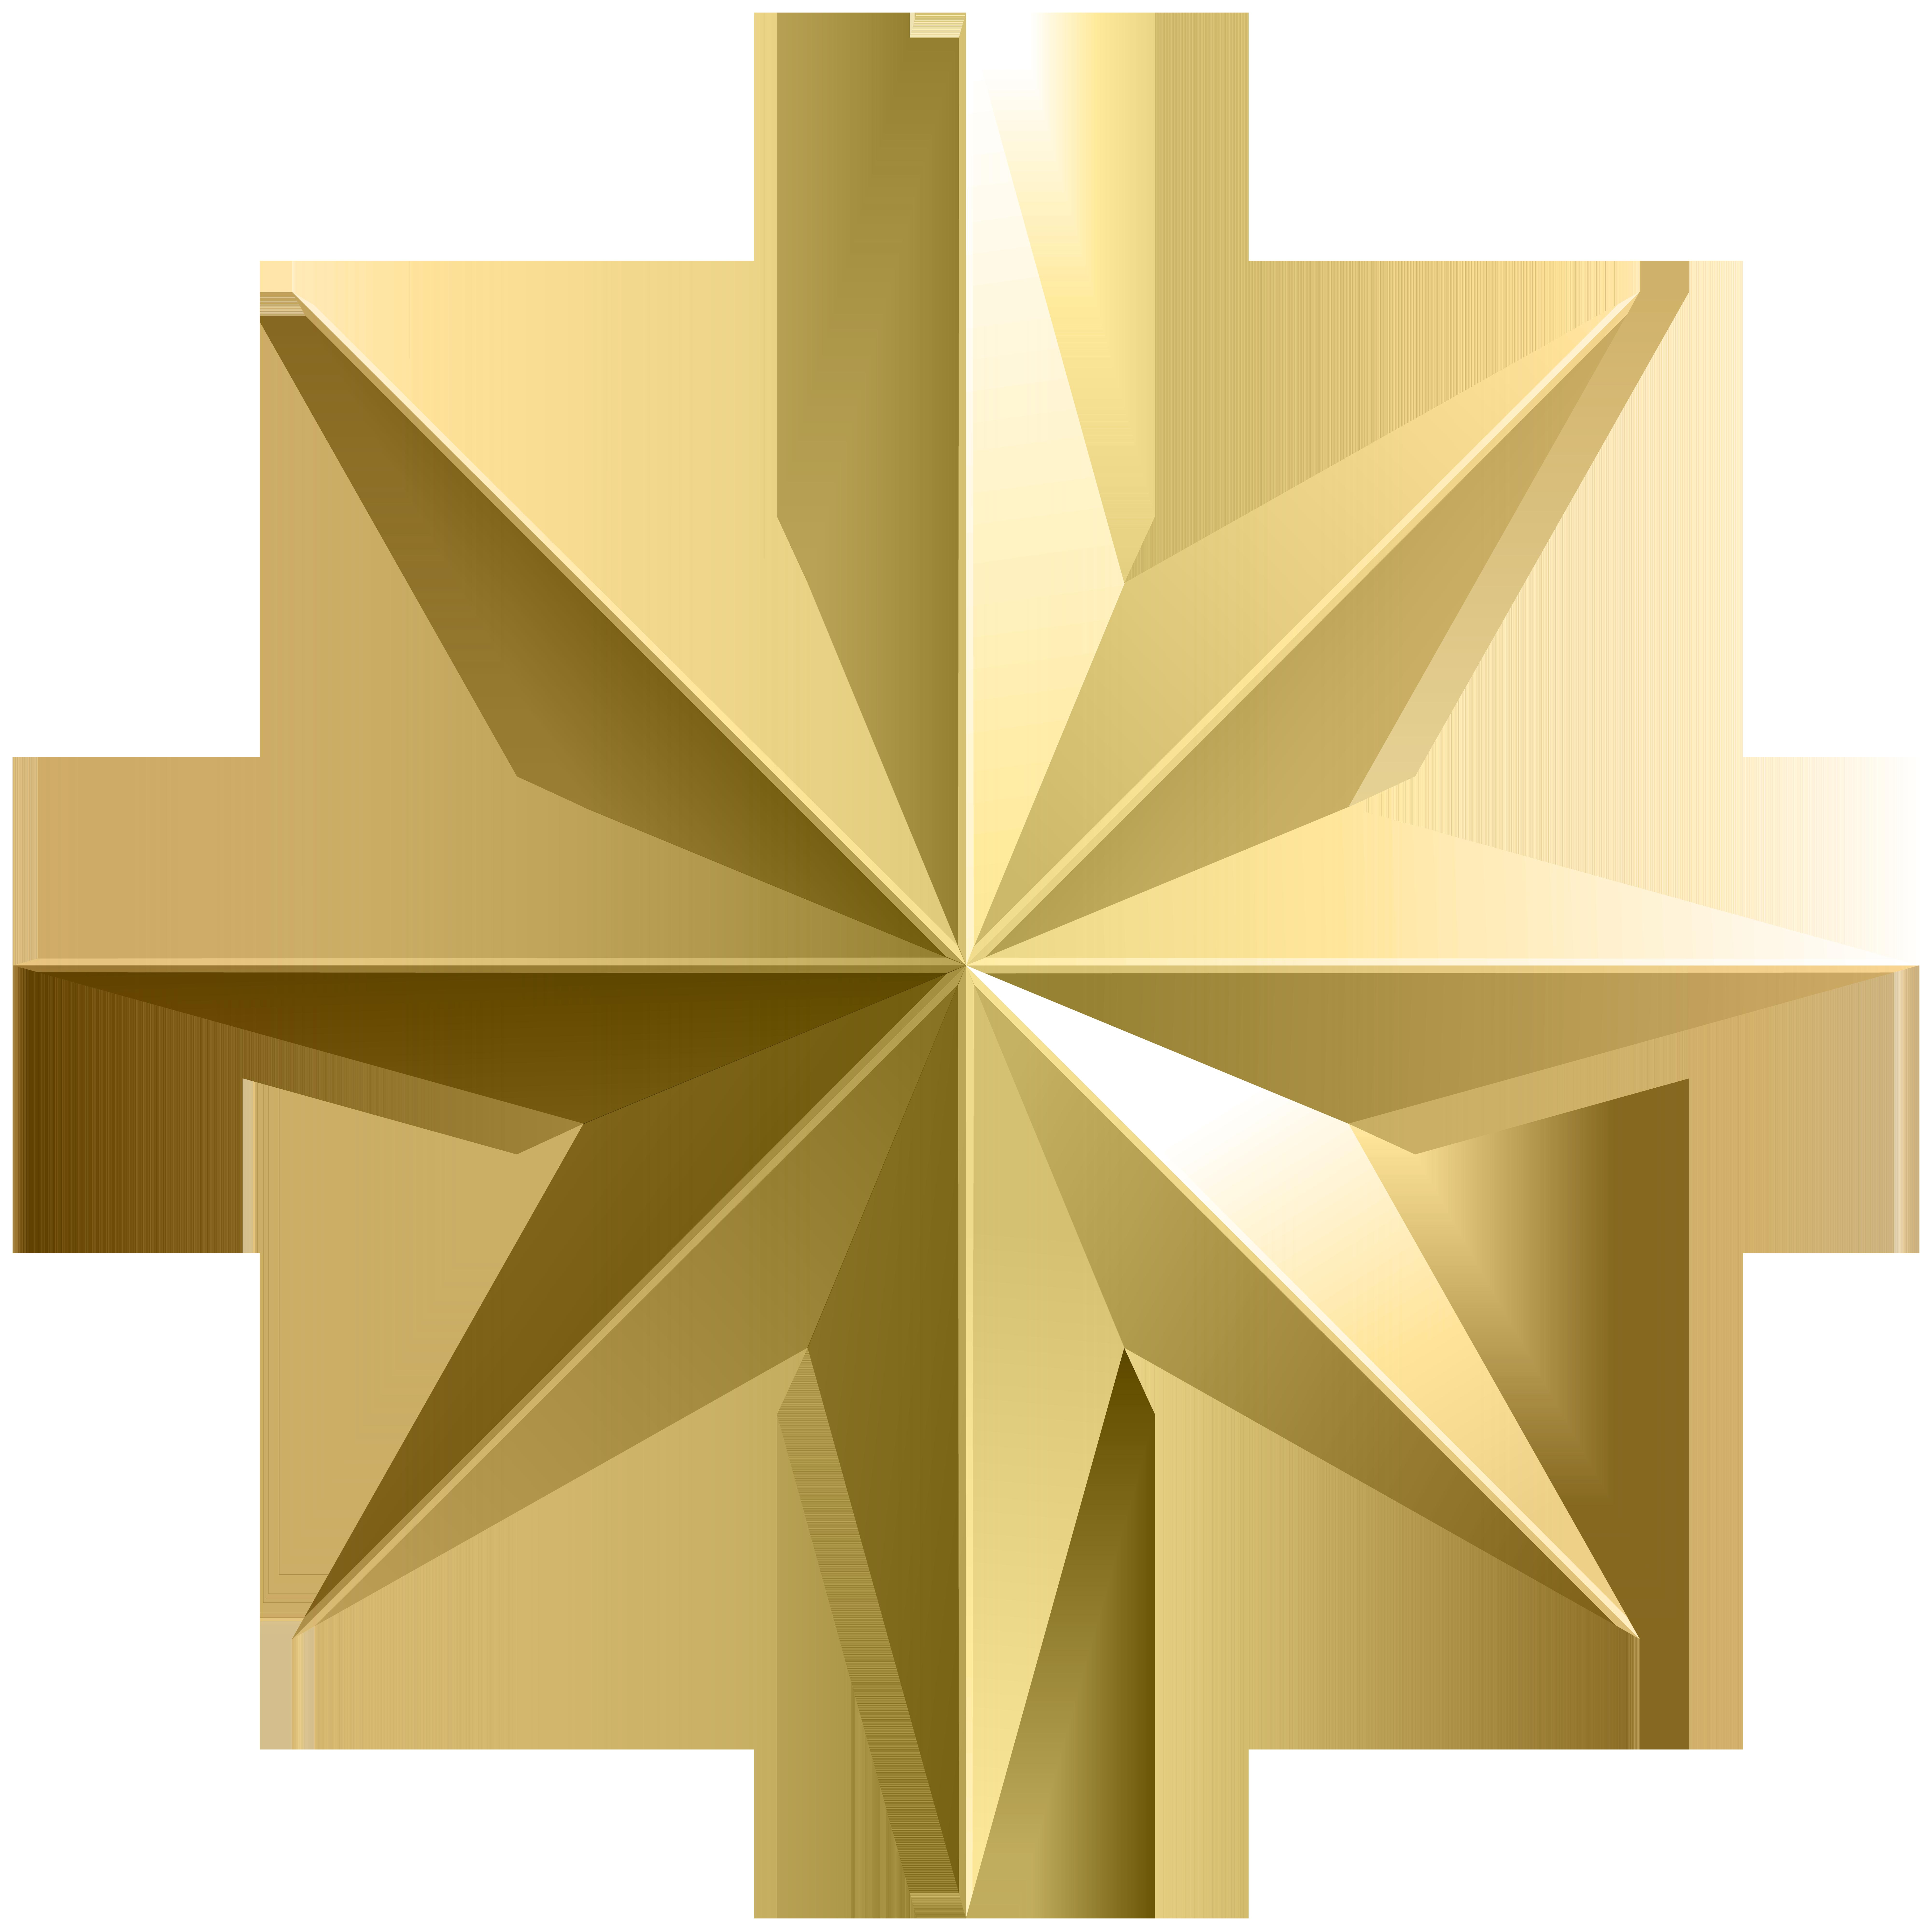 Star transparent png image. Laurel clipart gold silver bronze